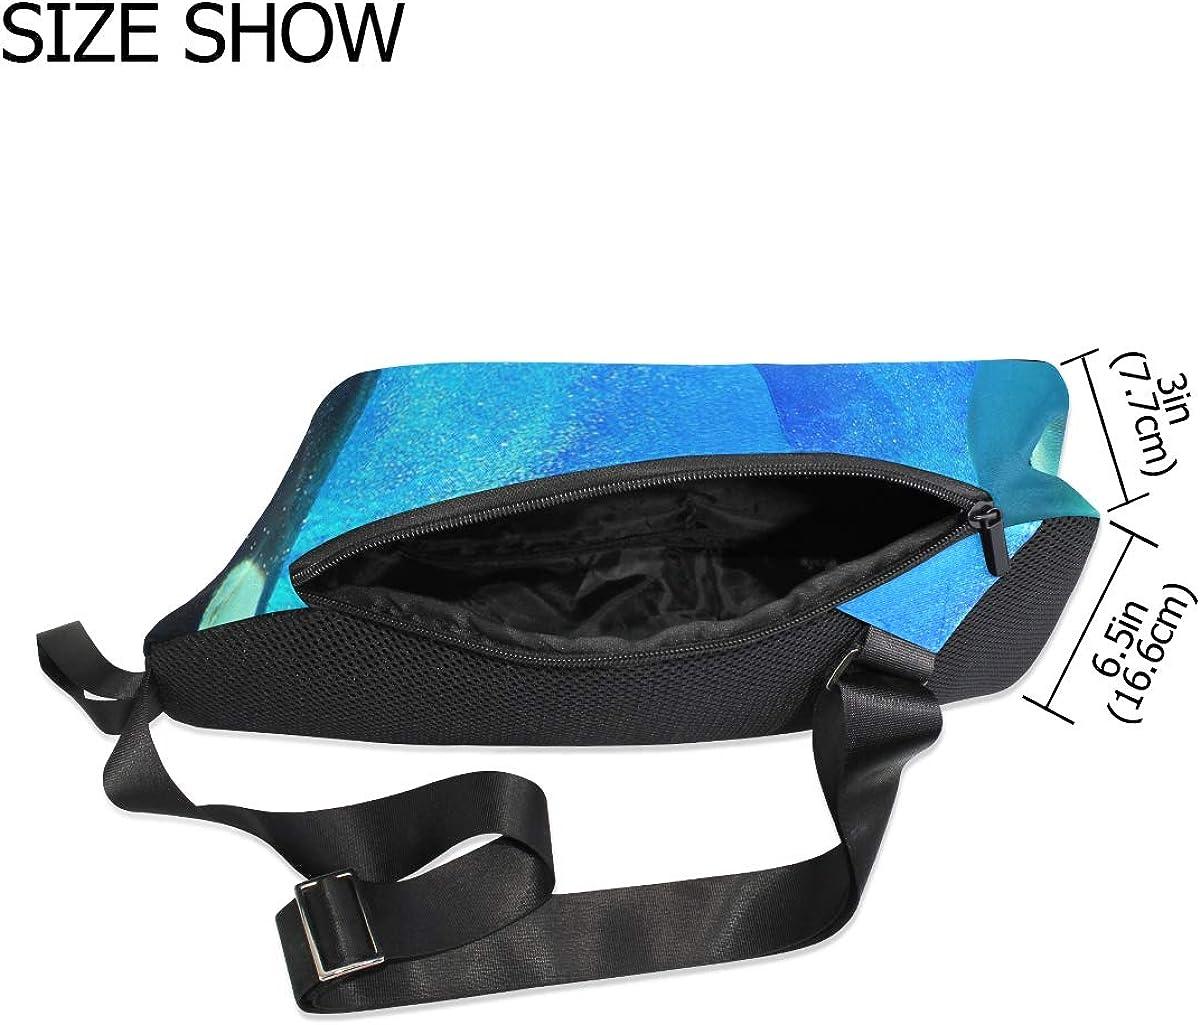 Killer Whale Men Women Durable Satchel Messenger Bags Crossbody Sling Working Bag Travel Shoulder Bags Office//School